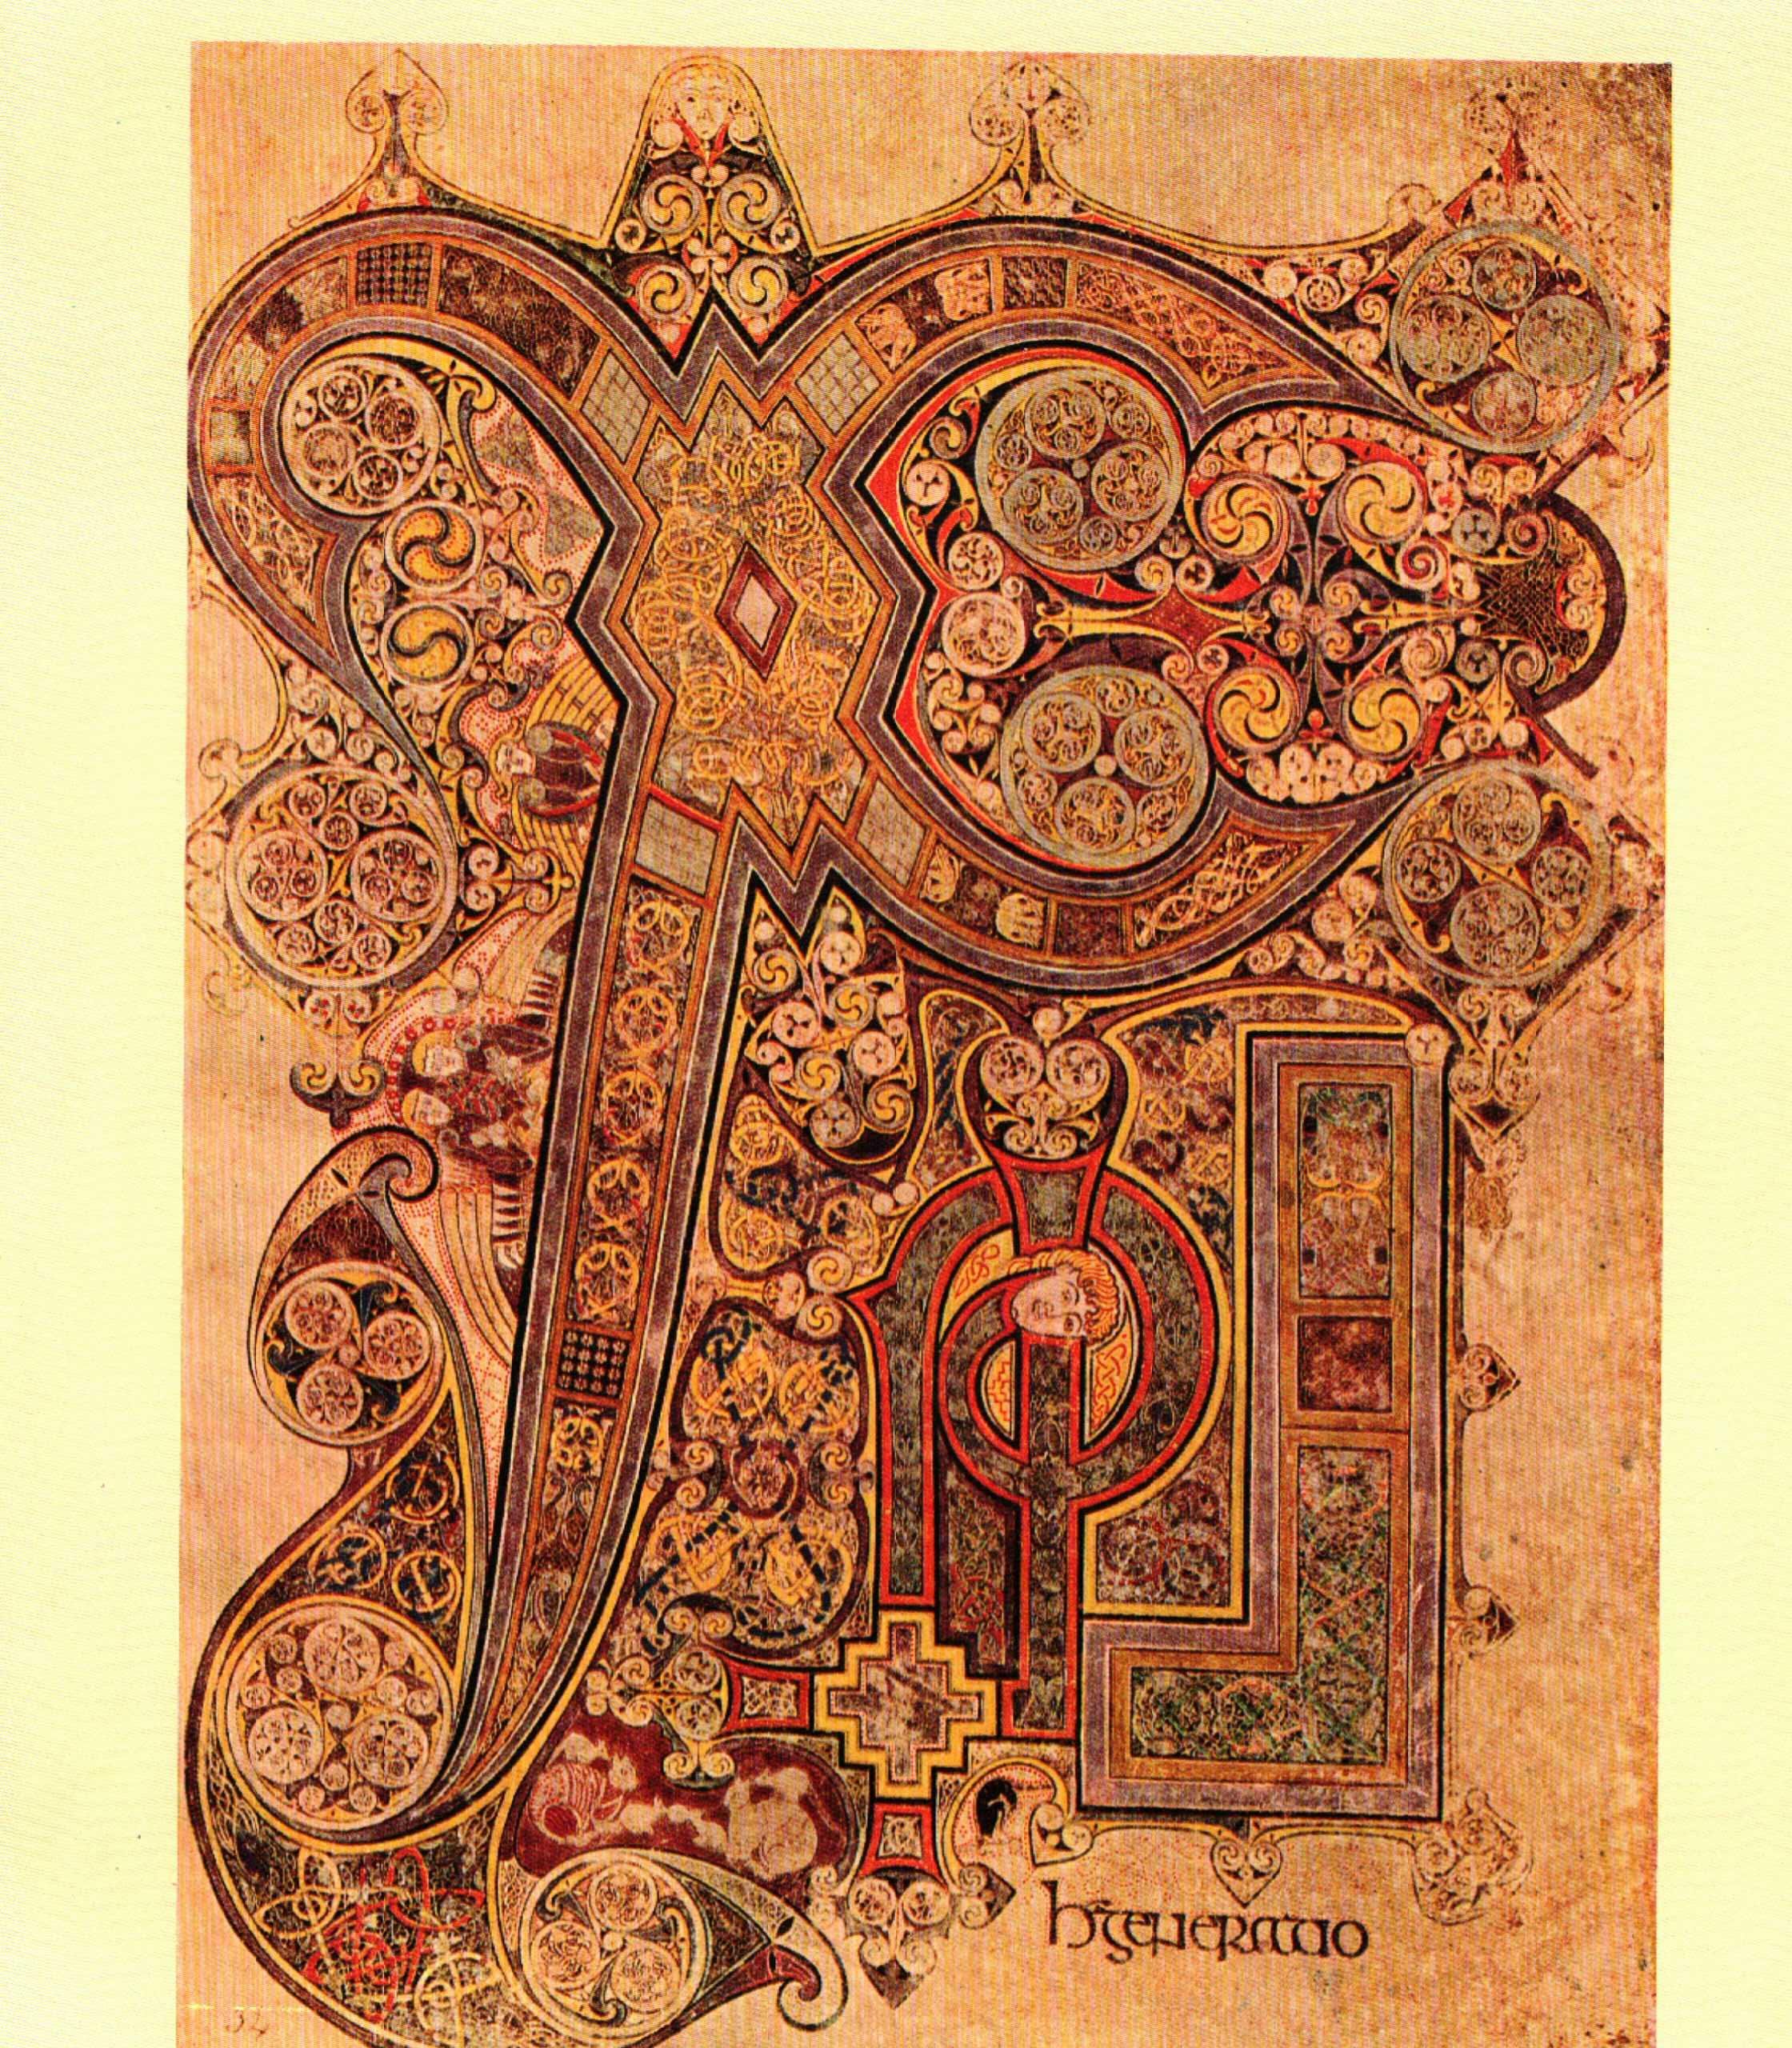 The Book of Kells - Un Italiano a Sligo